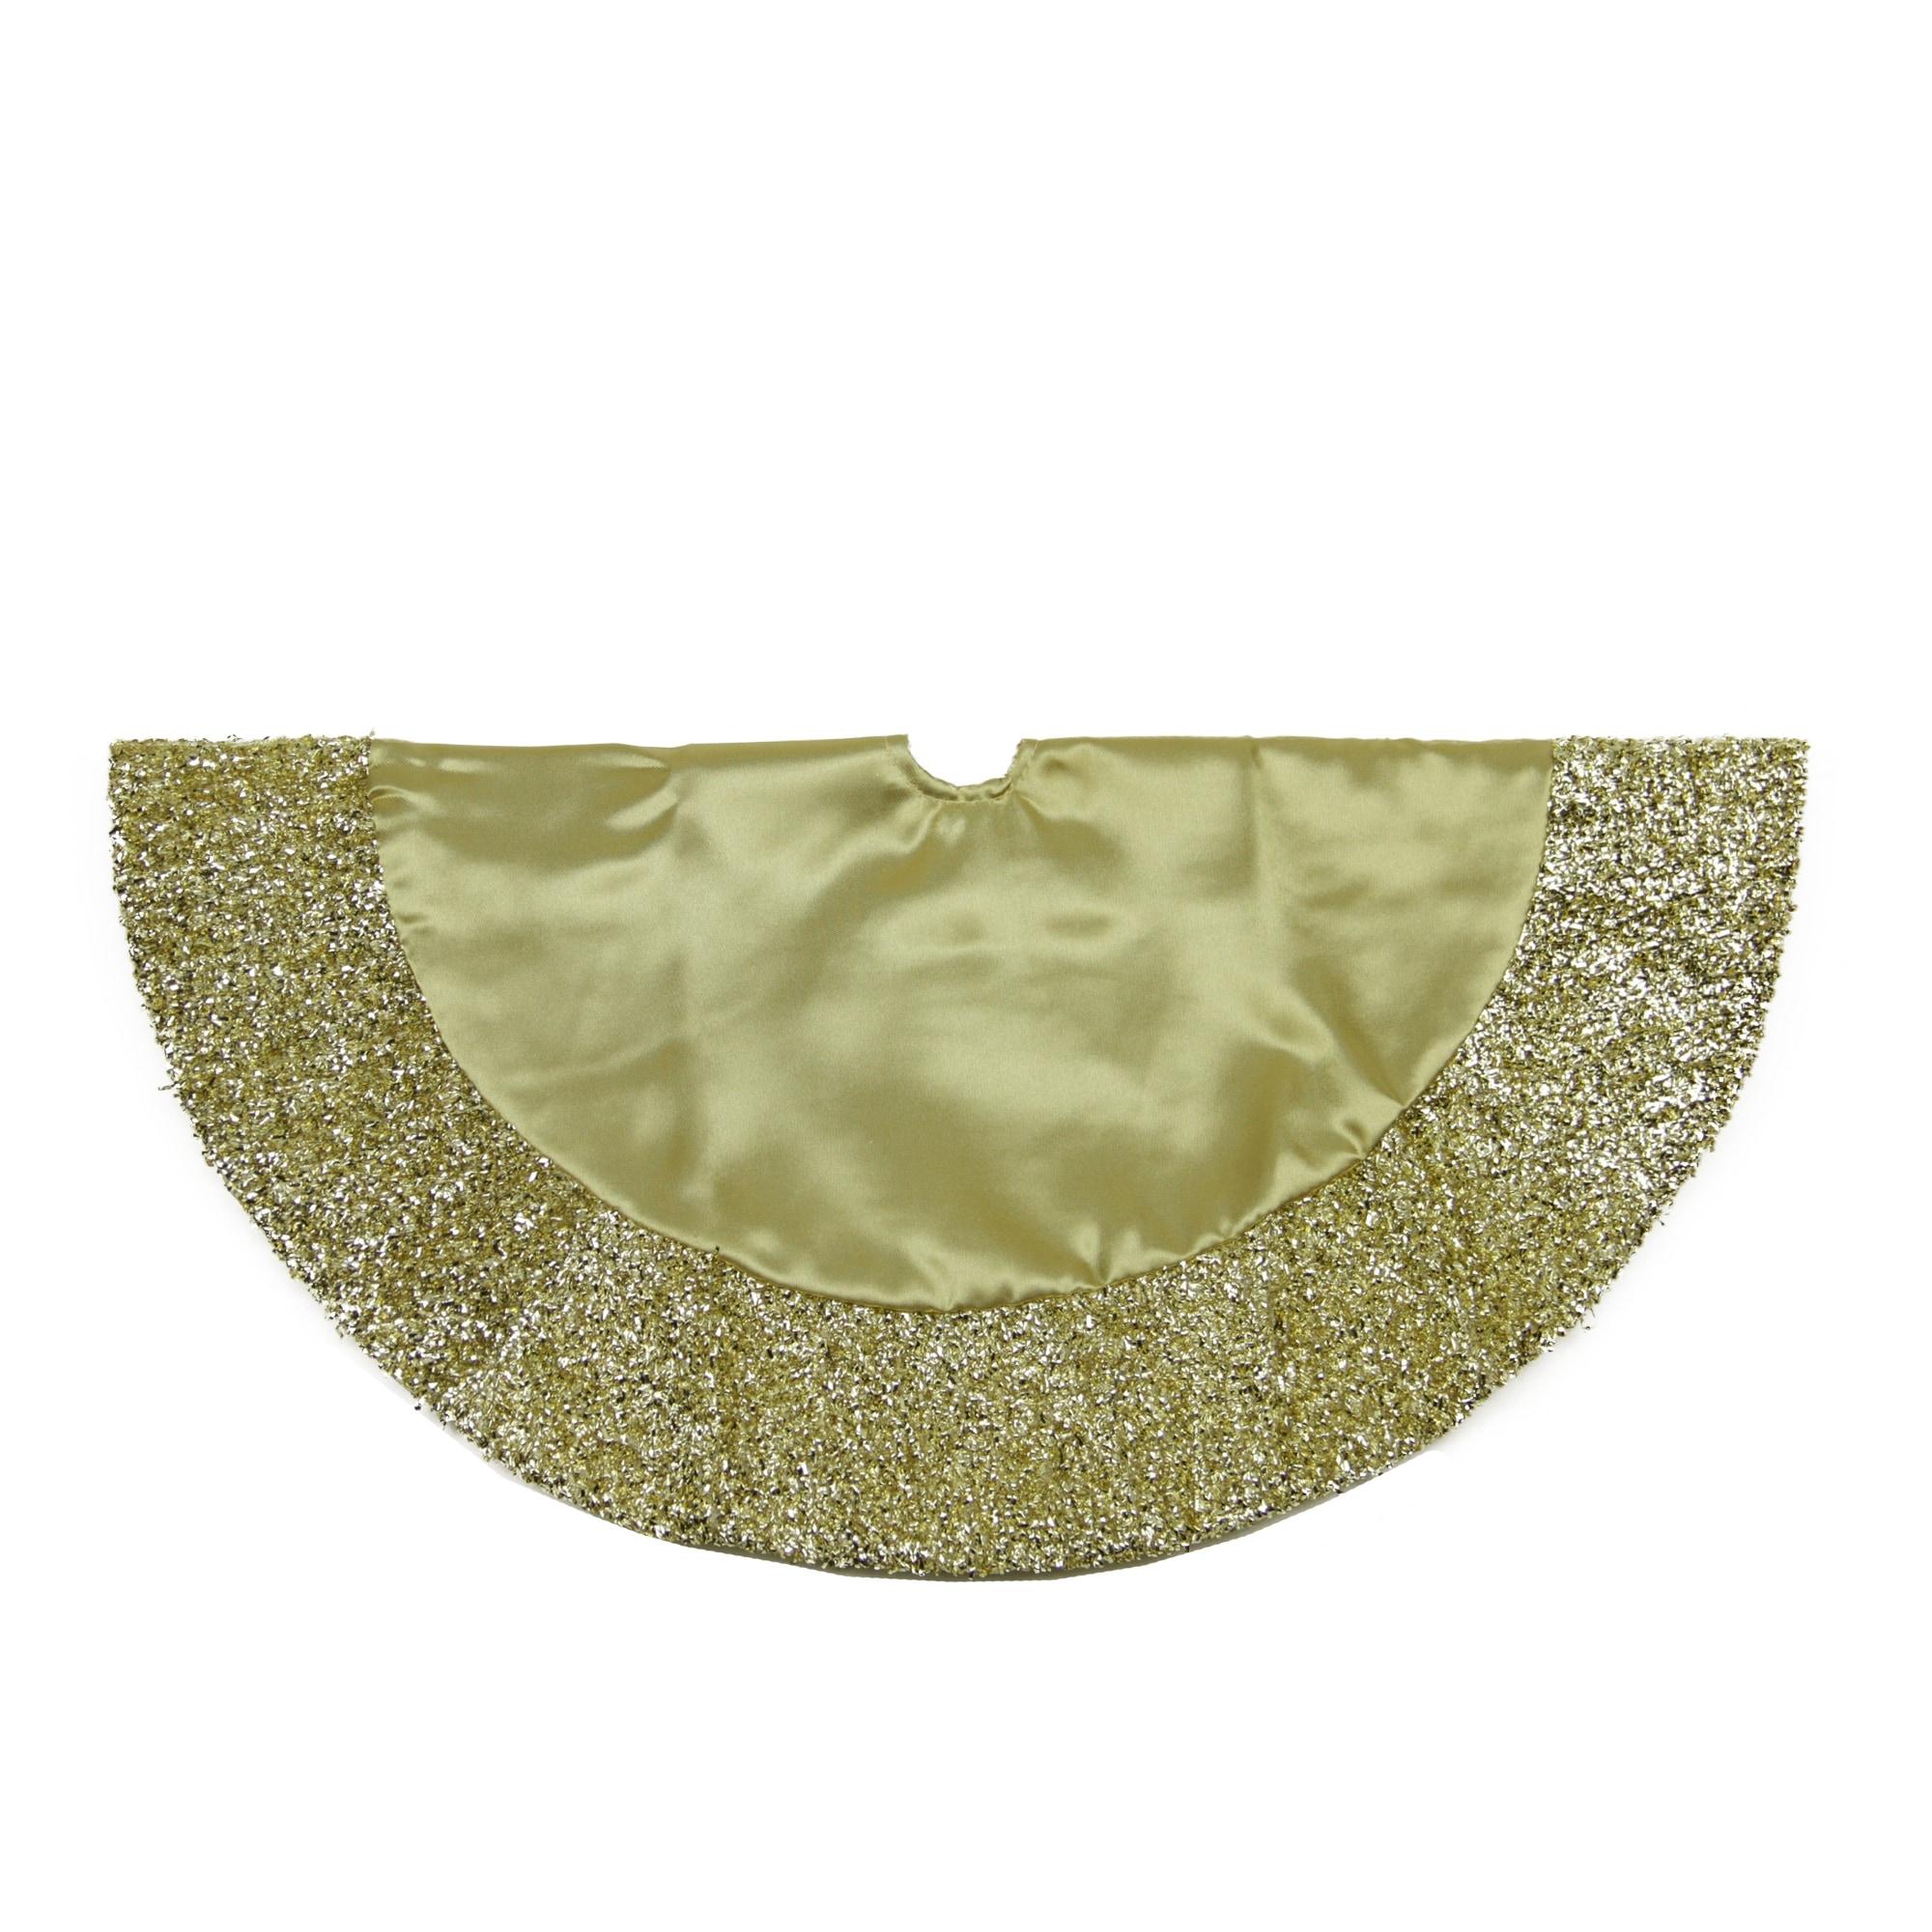 20 Gold Mini Christmas Tree Skirt With Metallic Tinsel Trim